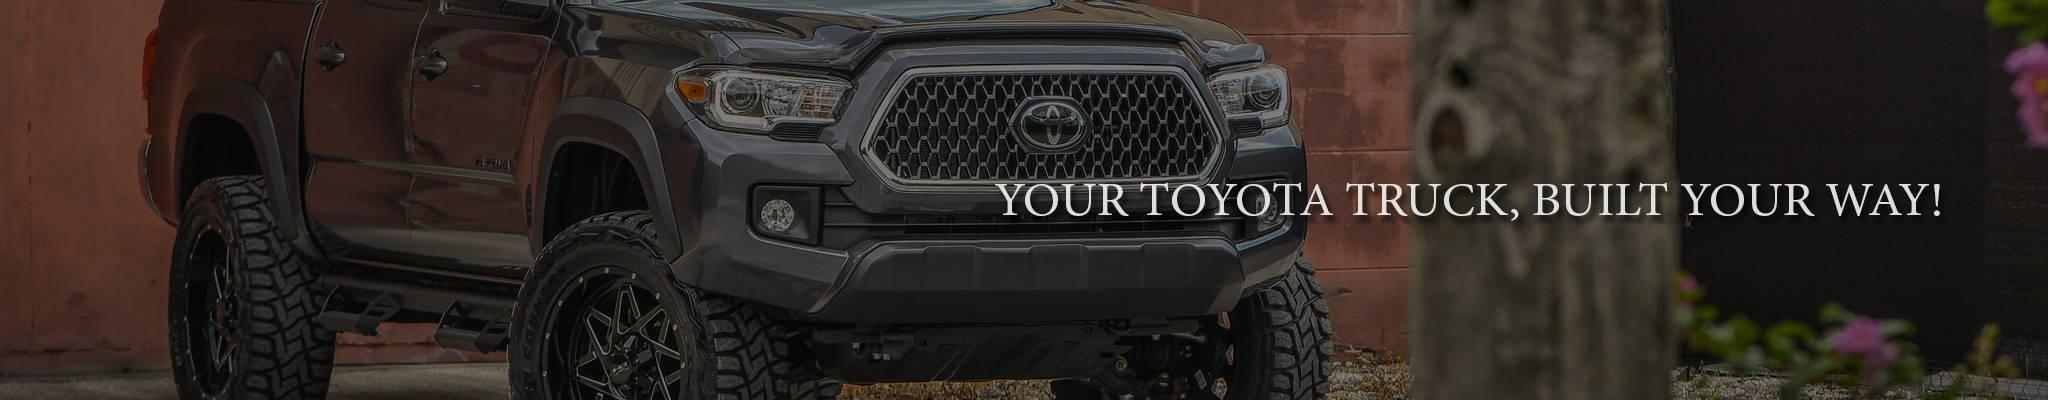 Customize your Toyota Tacoma & Tundra at 3C Trucks